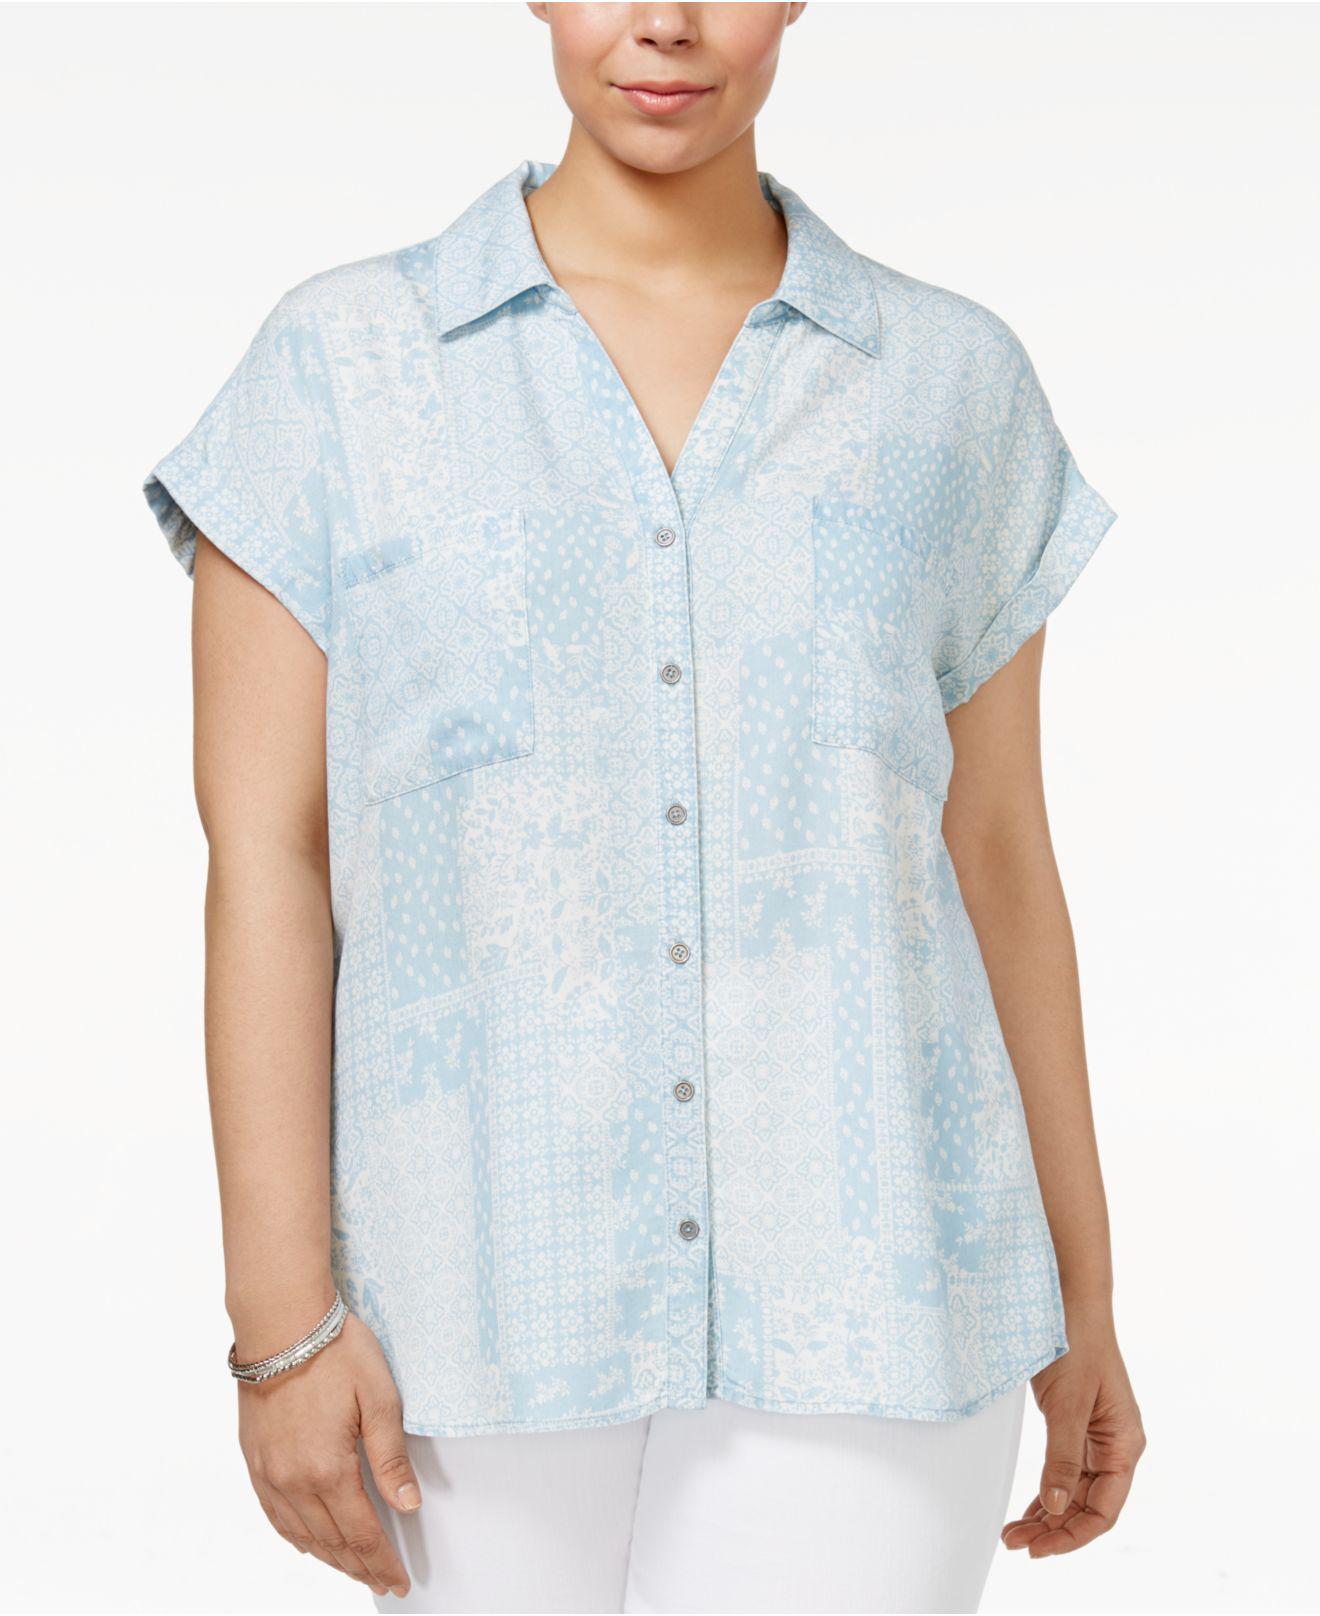 b4cc4af534 Short Sleeve Denim Shirt Plus Size - Data Dynamic AG